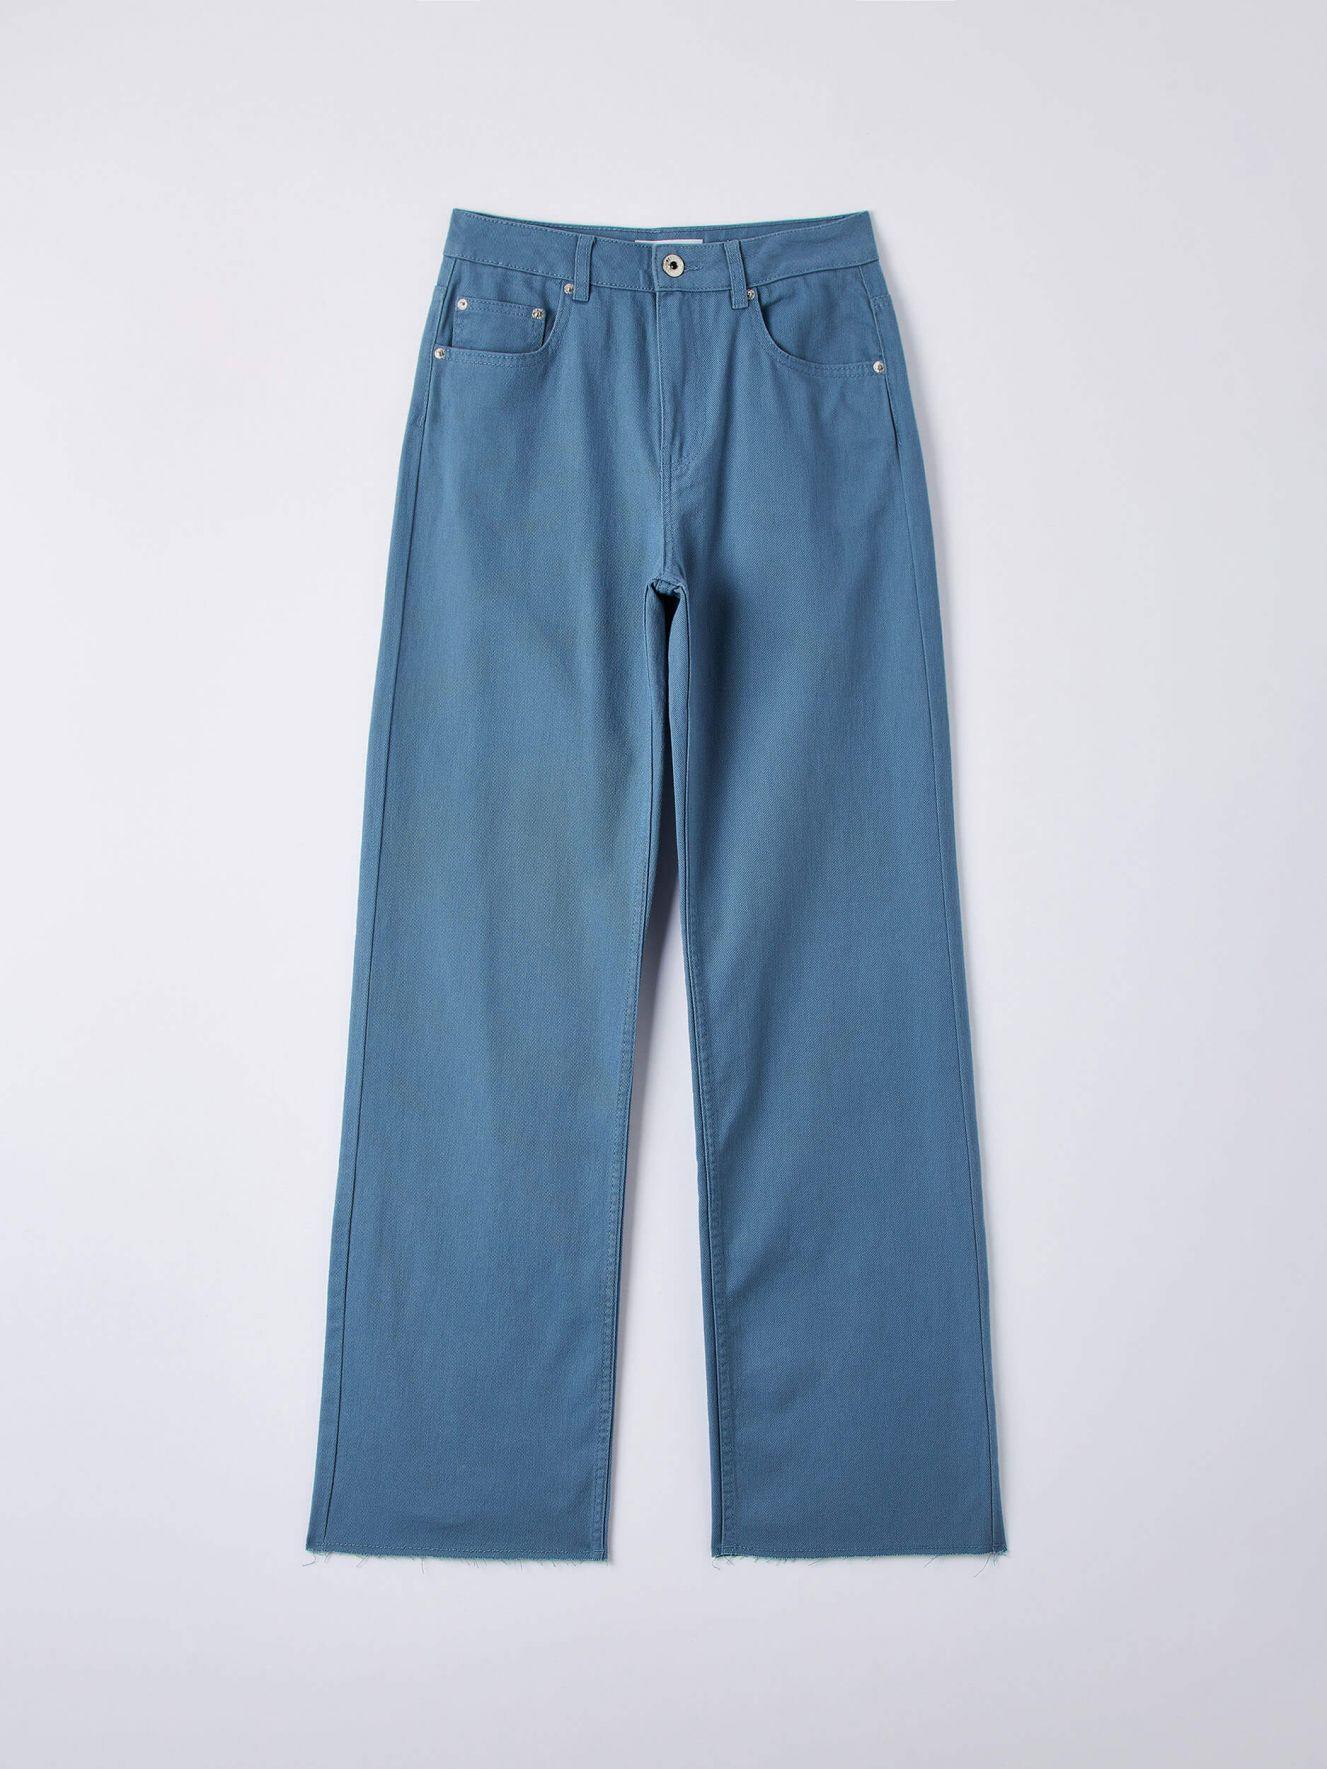 Pantalone Lungo Damen Terranova